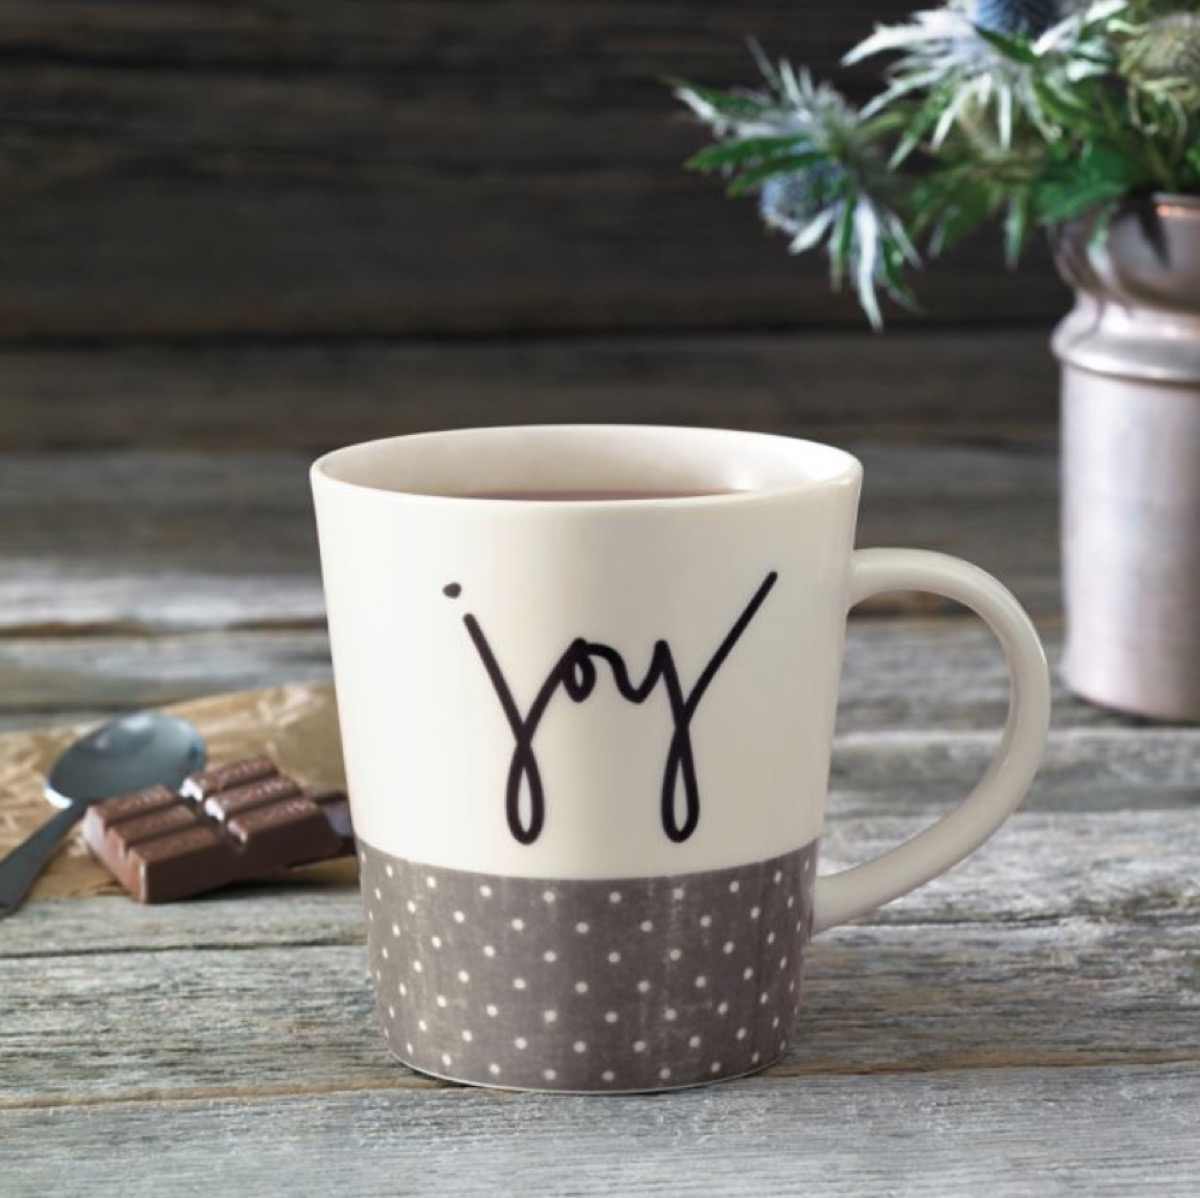 joy mug, ellen degeneres homeware, celebrity homeware